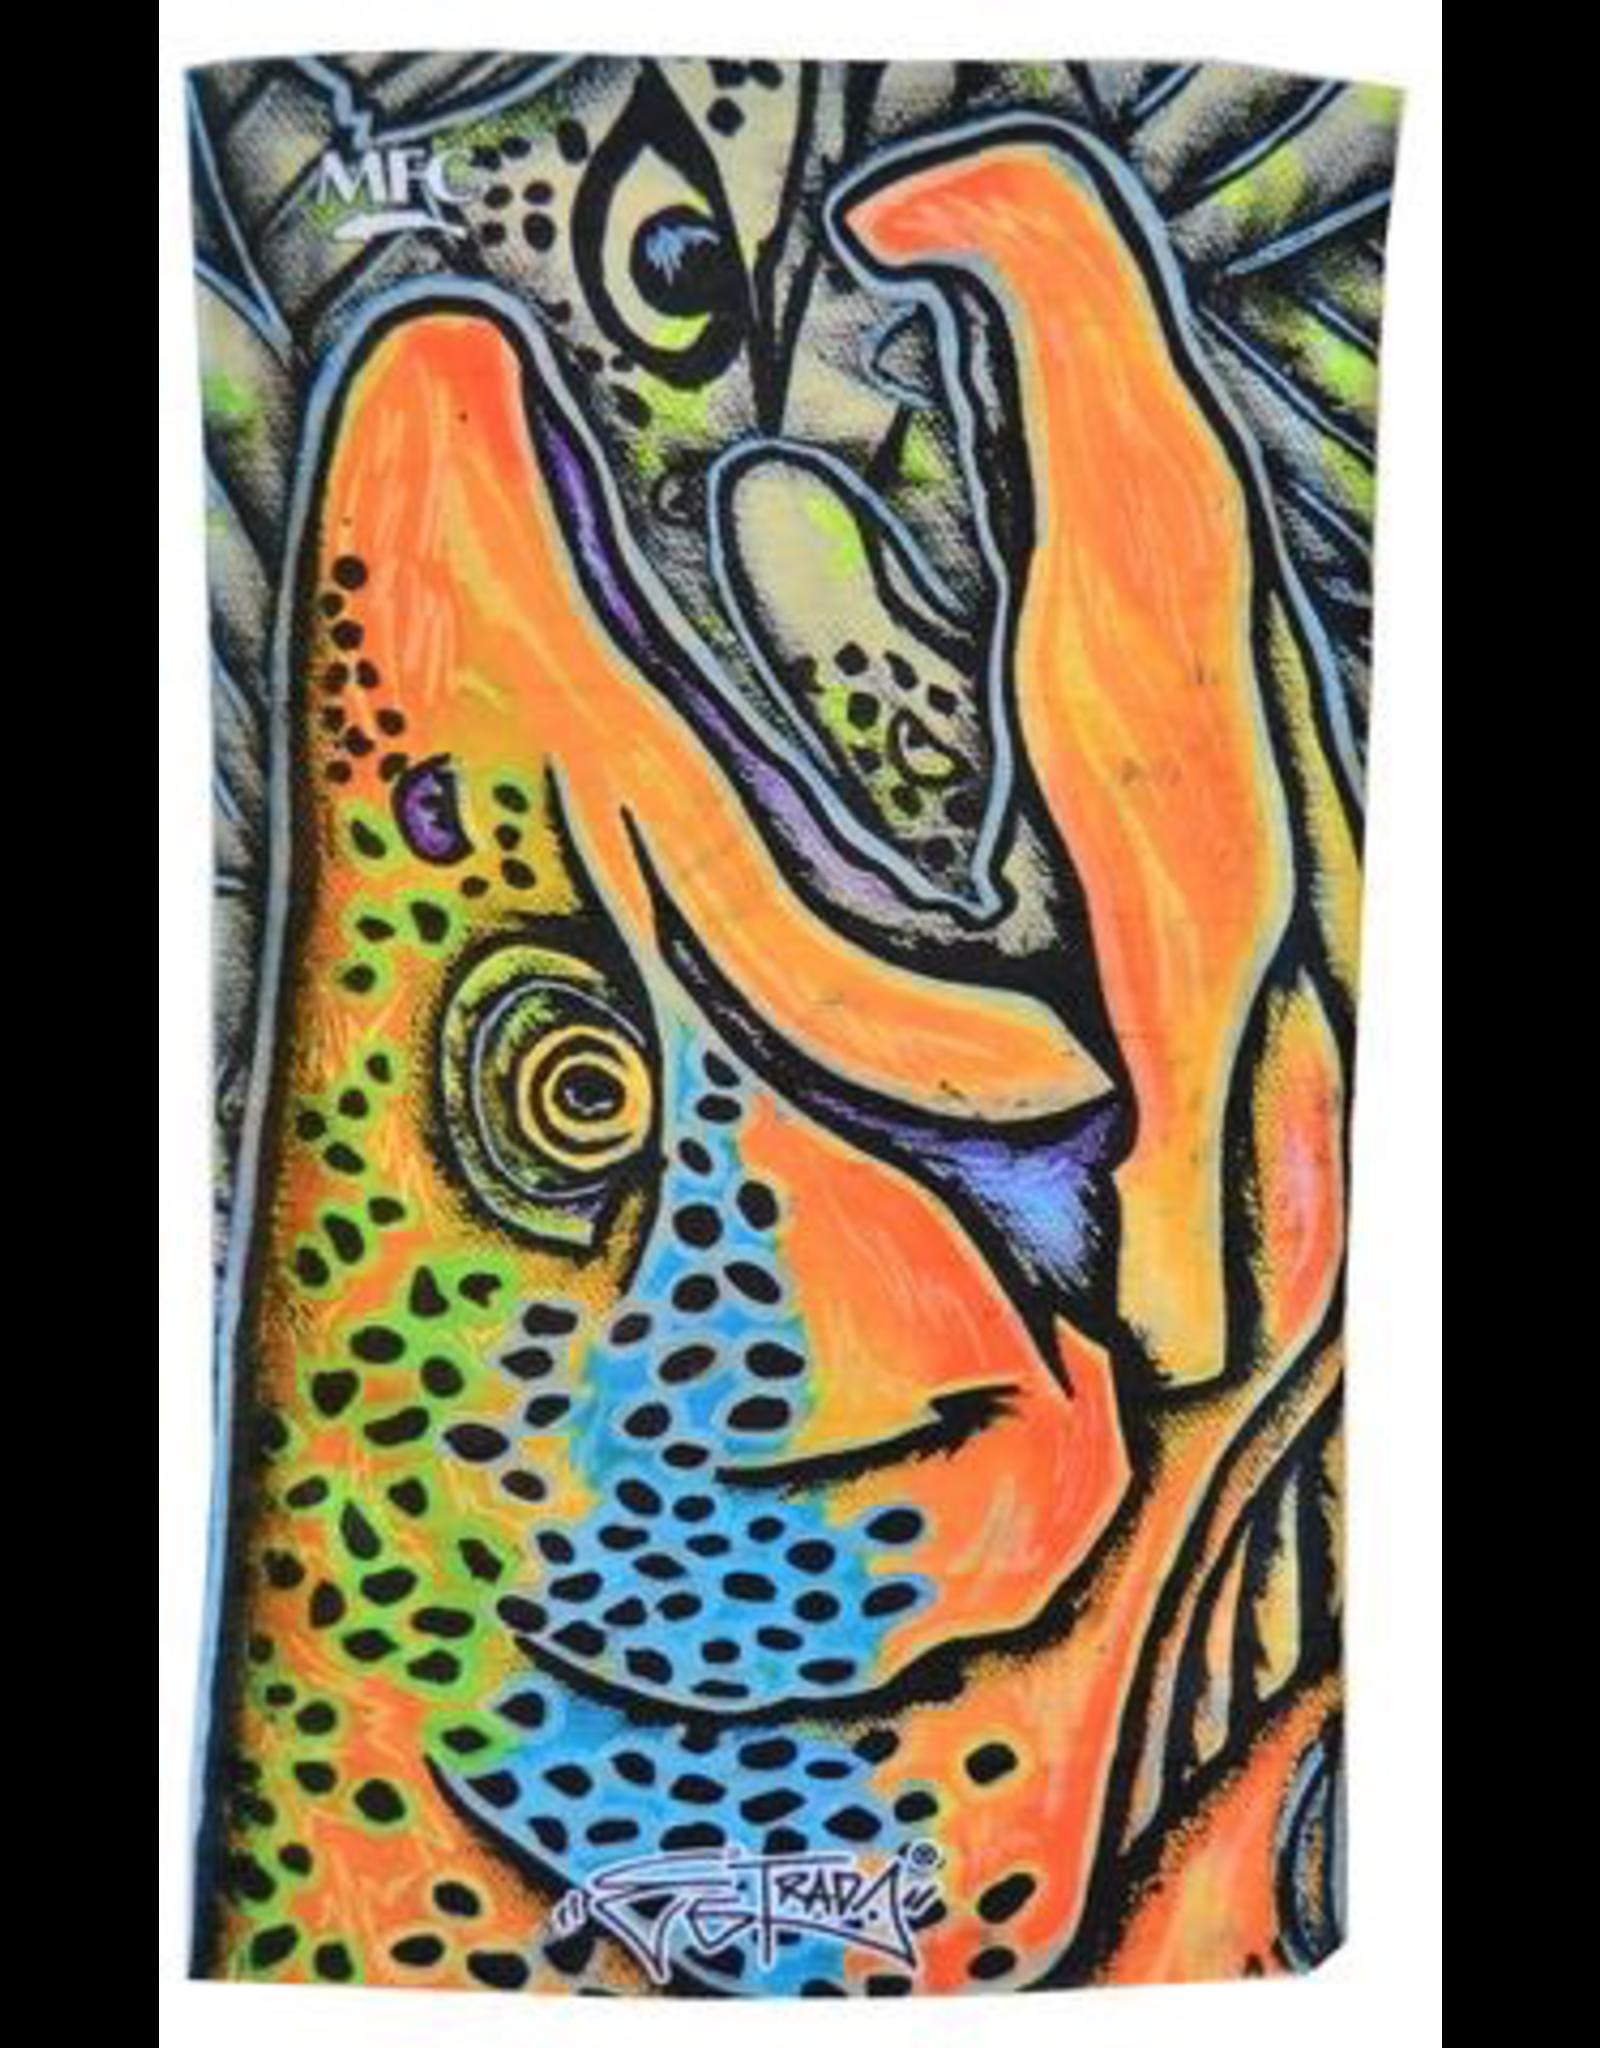 MFC Fish Gaiter Estrada Brown Trout